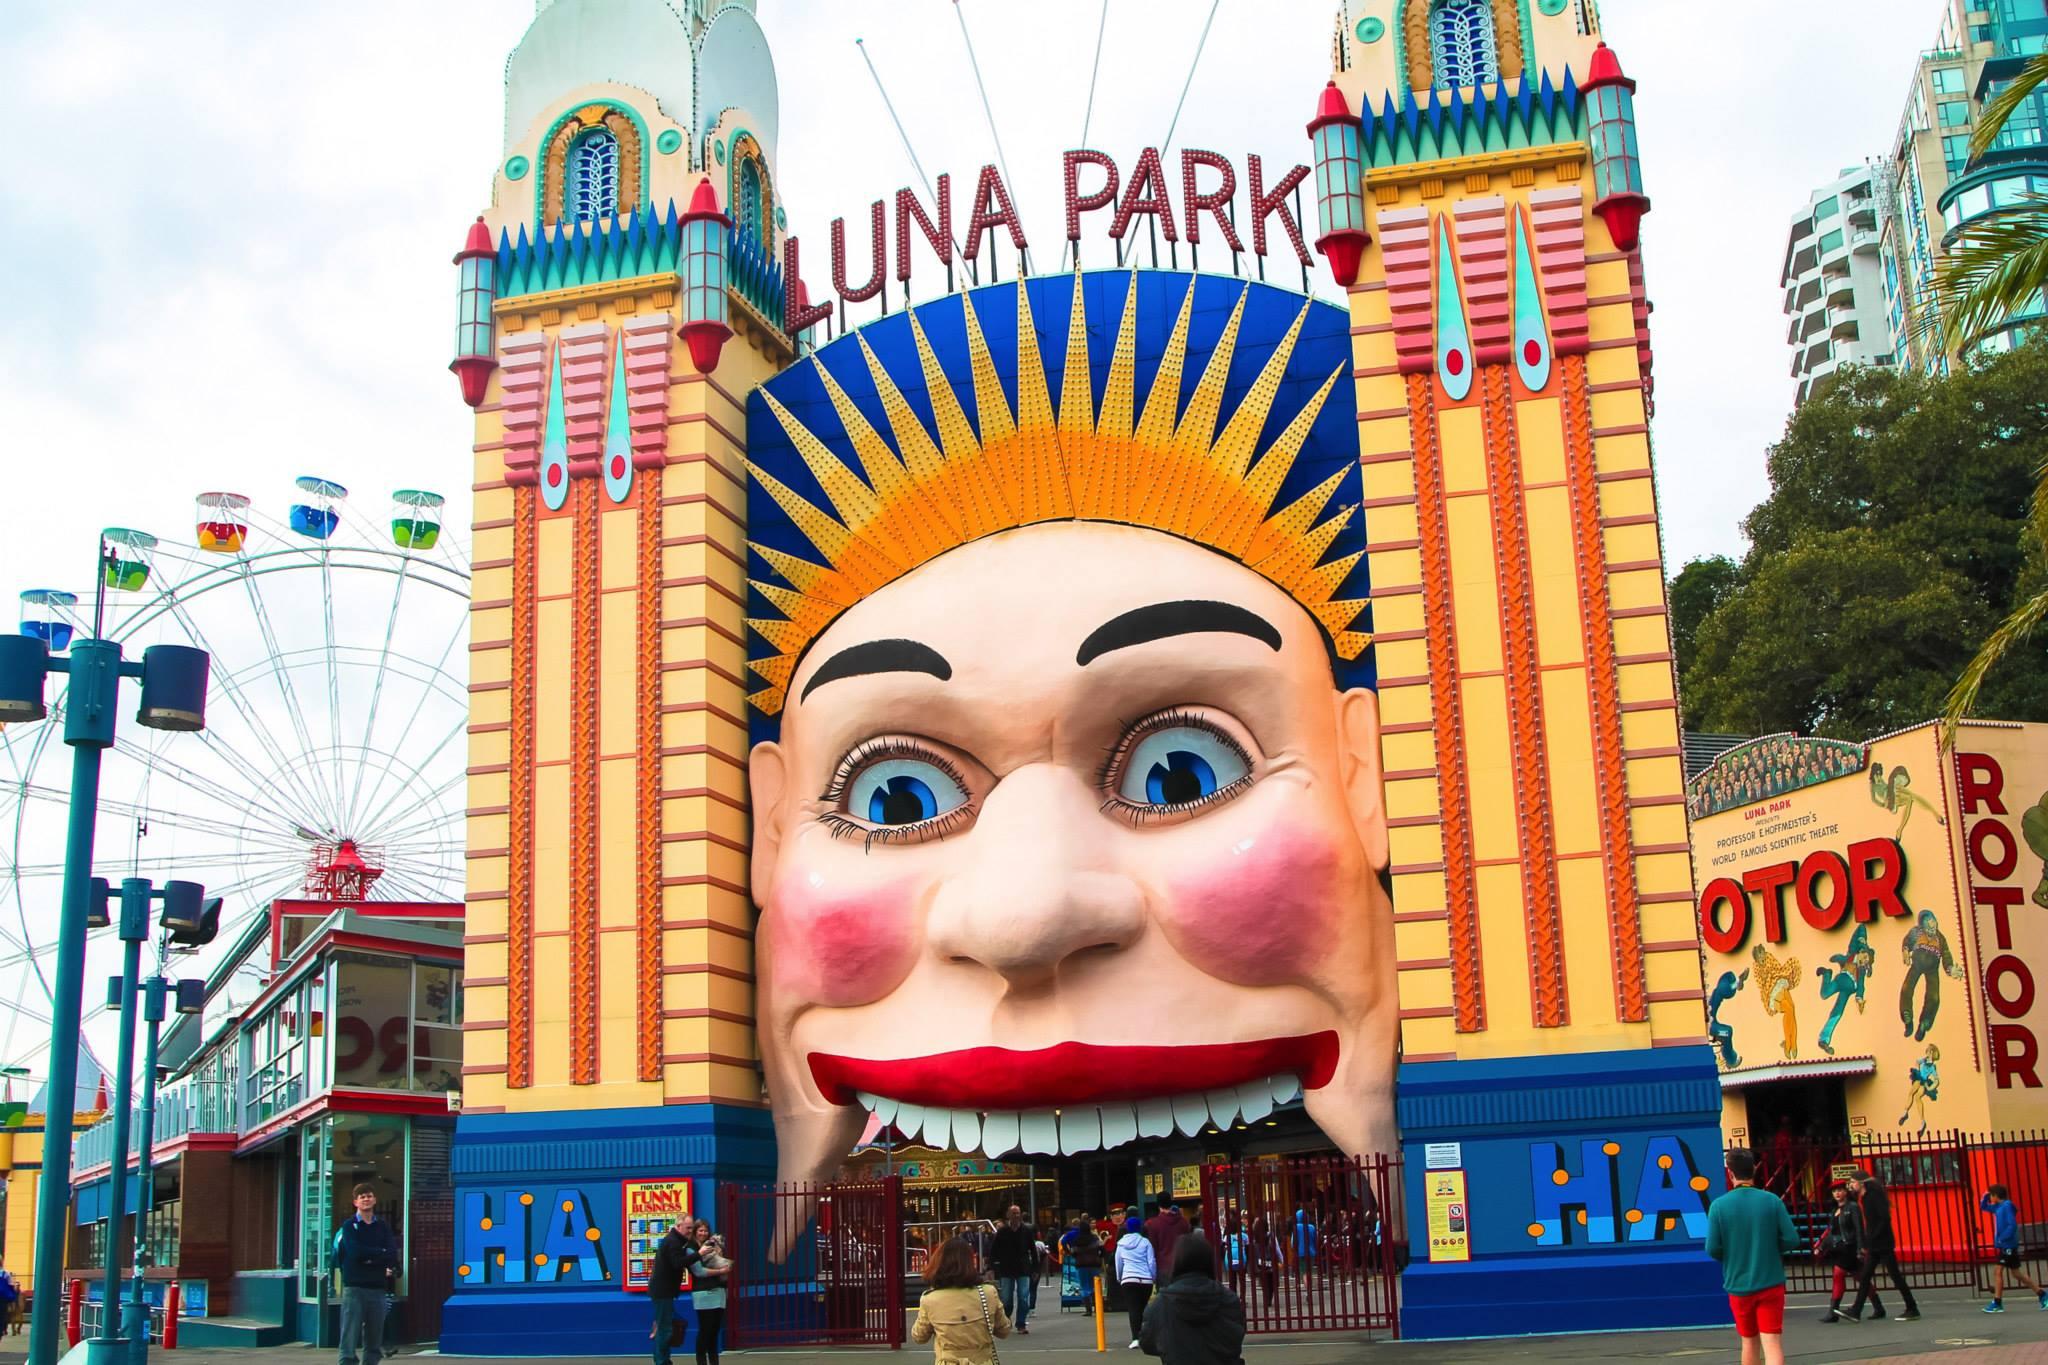 A (Free-ish) afternoon in Luna Park, Sydney, Australia ...  Luna